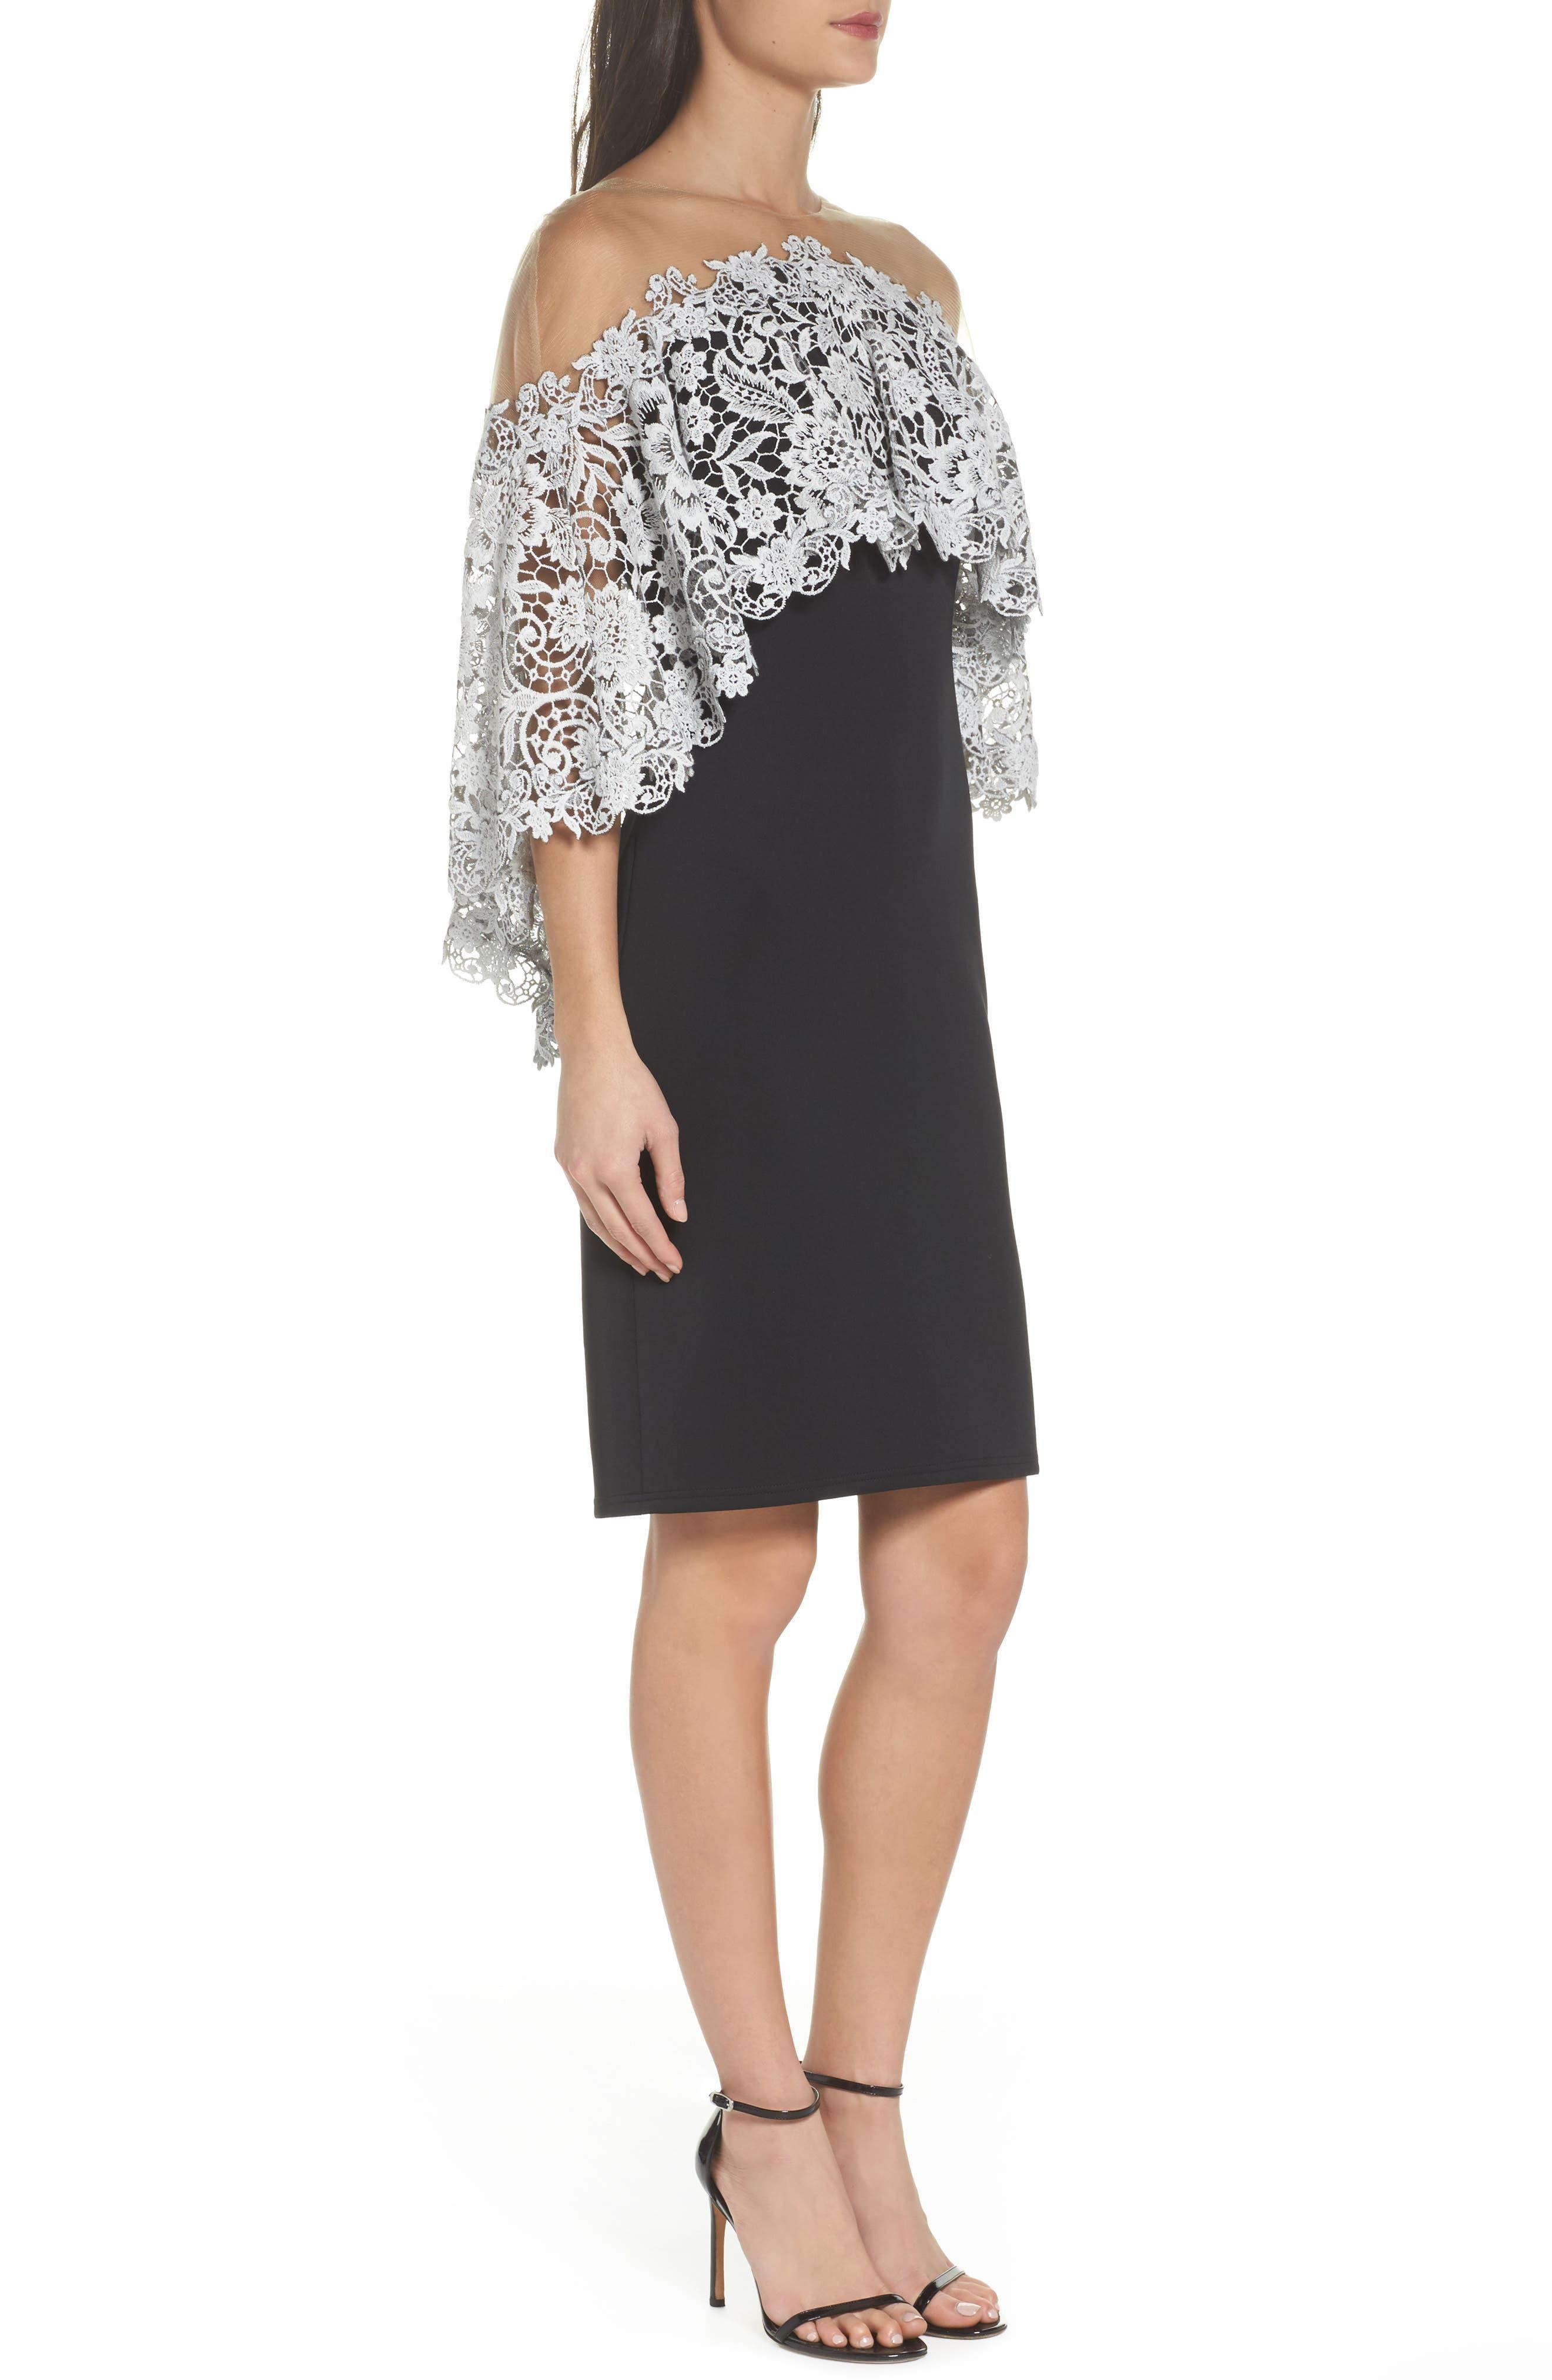 Illusion Neck Cape Dress,                             Alternate thumbnail 3, color,                             Black/ Ivory